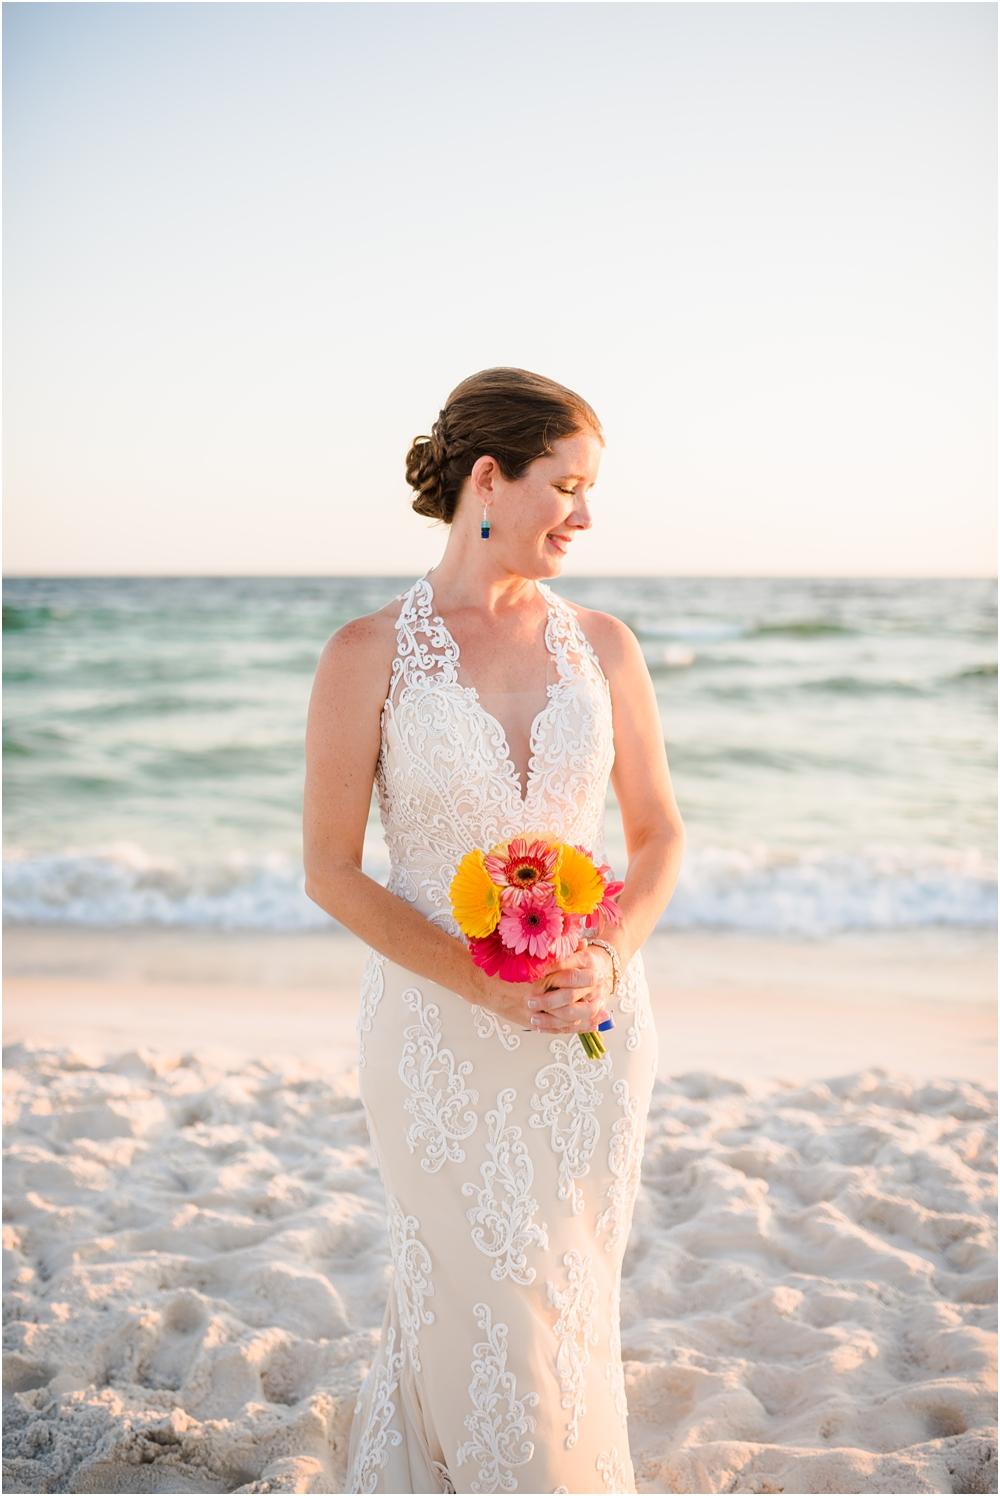 ledman-wedding-kiersten-stevenson-photography-30a-panama-city-beach-dothan-tallahassee-(479-of-763).JPG